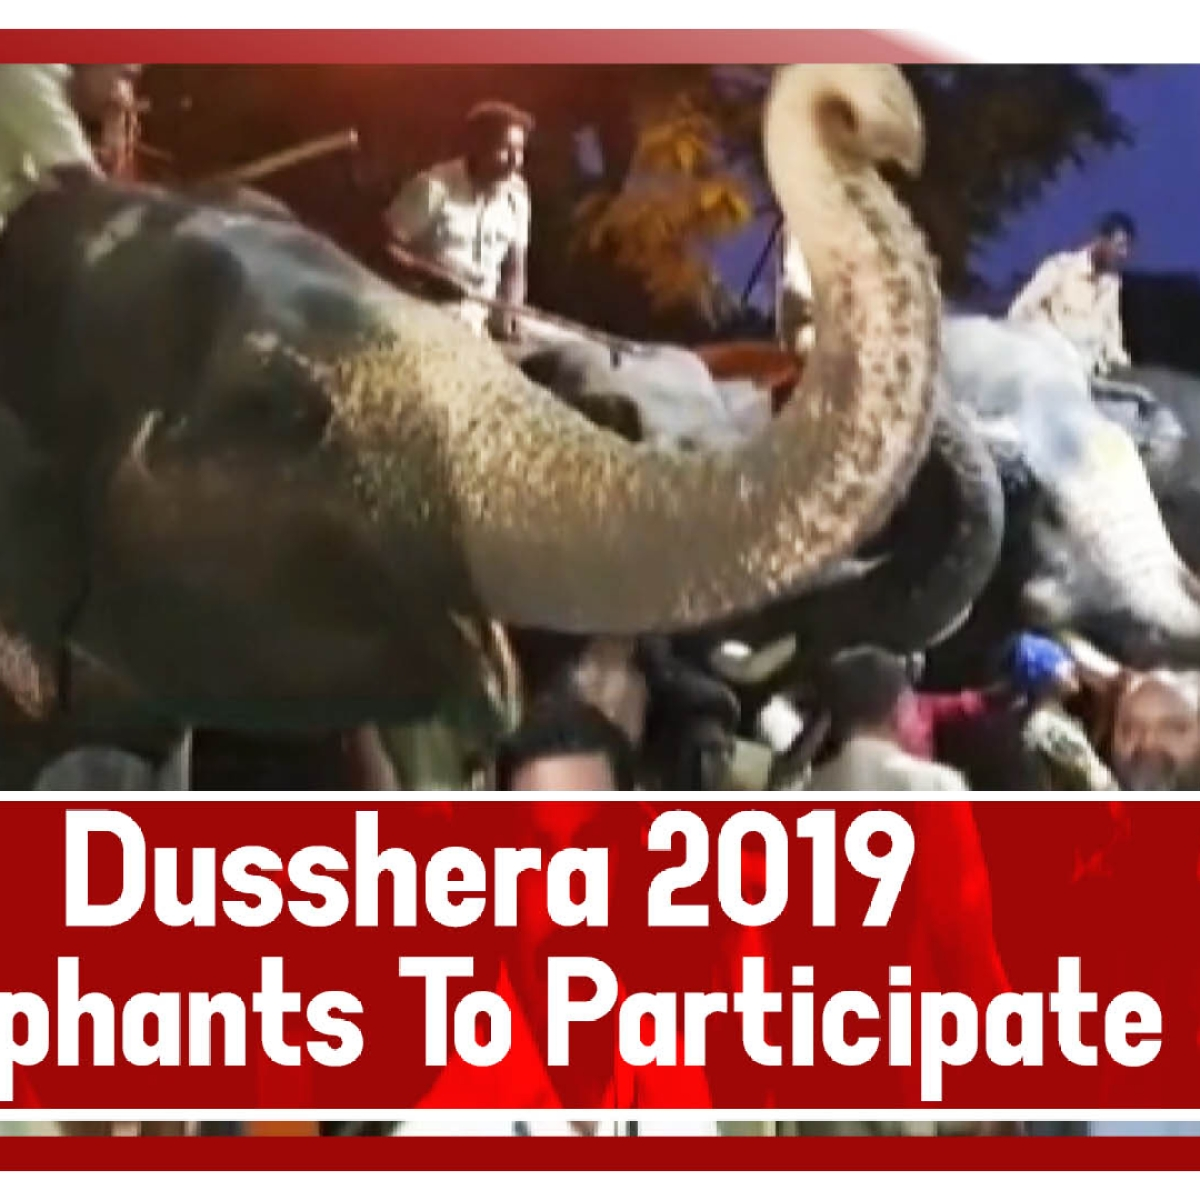 Dusshera 2019: Elephants To Participate In 'Jamboo Savari' Take Blessings At Dargah In Mysuru